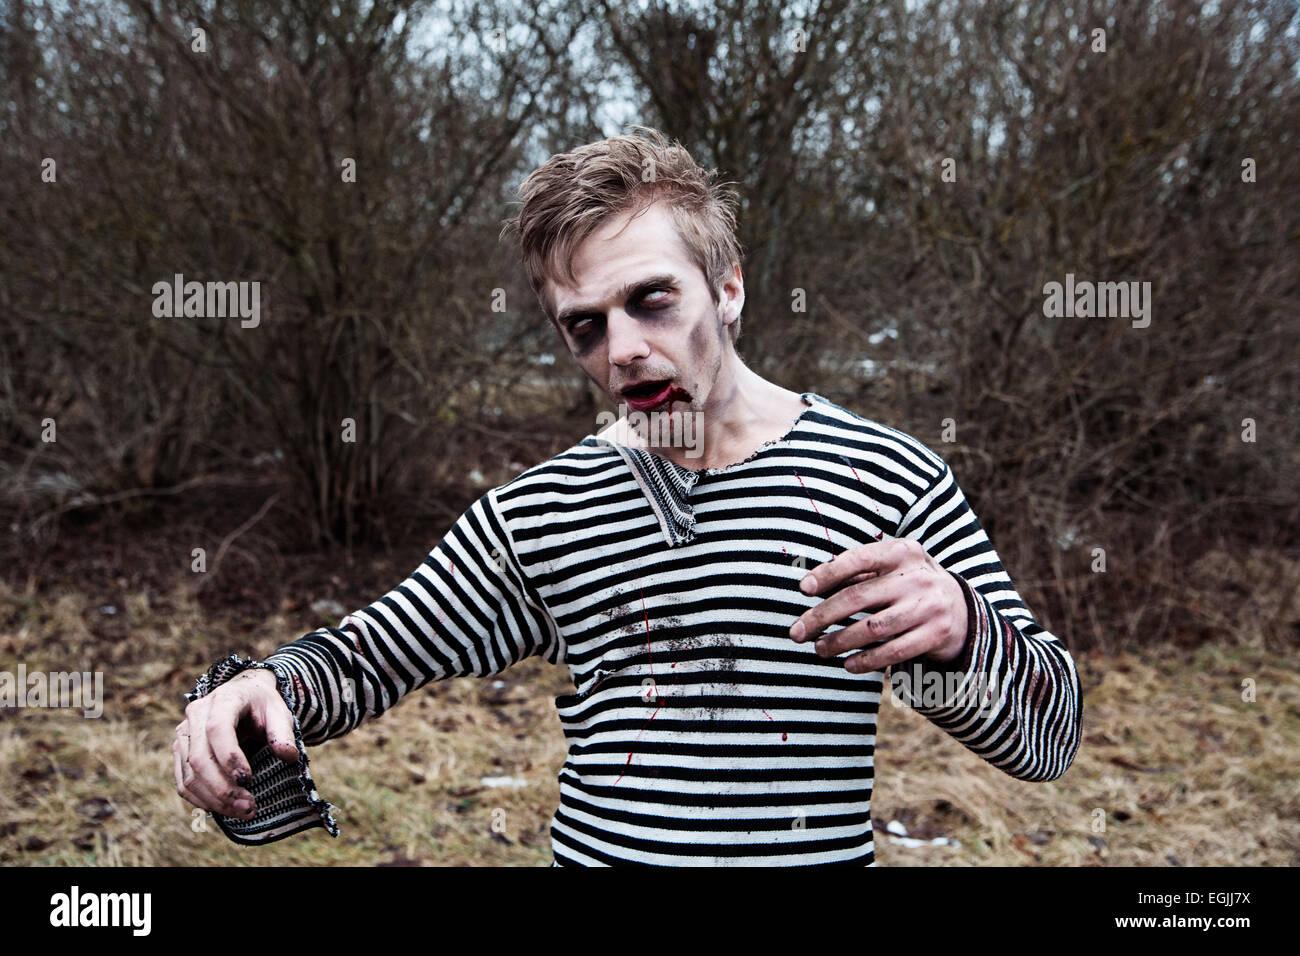 Creepy Makeup Imagenes De Stock Creepy Makeup Fotos De Stock Alamy - Maquillaje-zombie-hombre